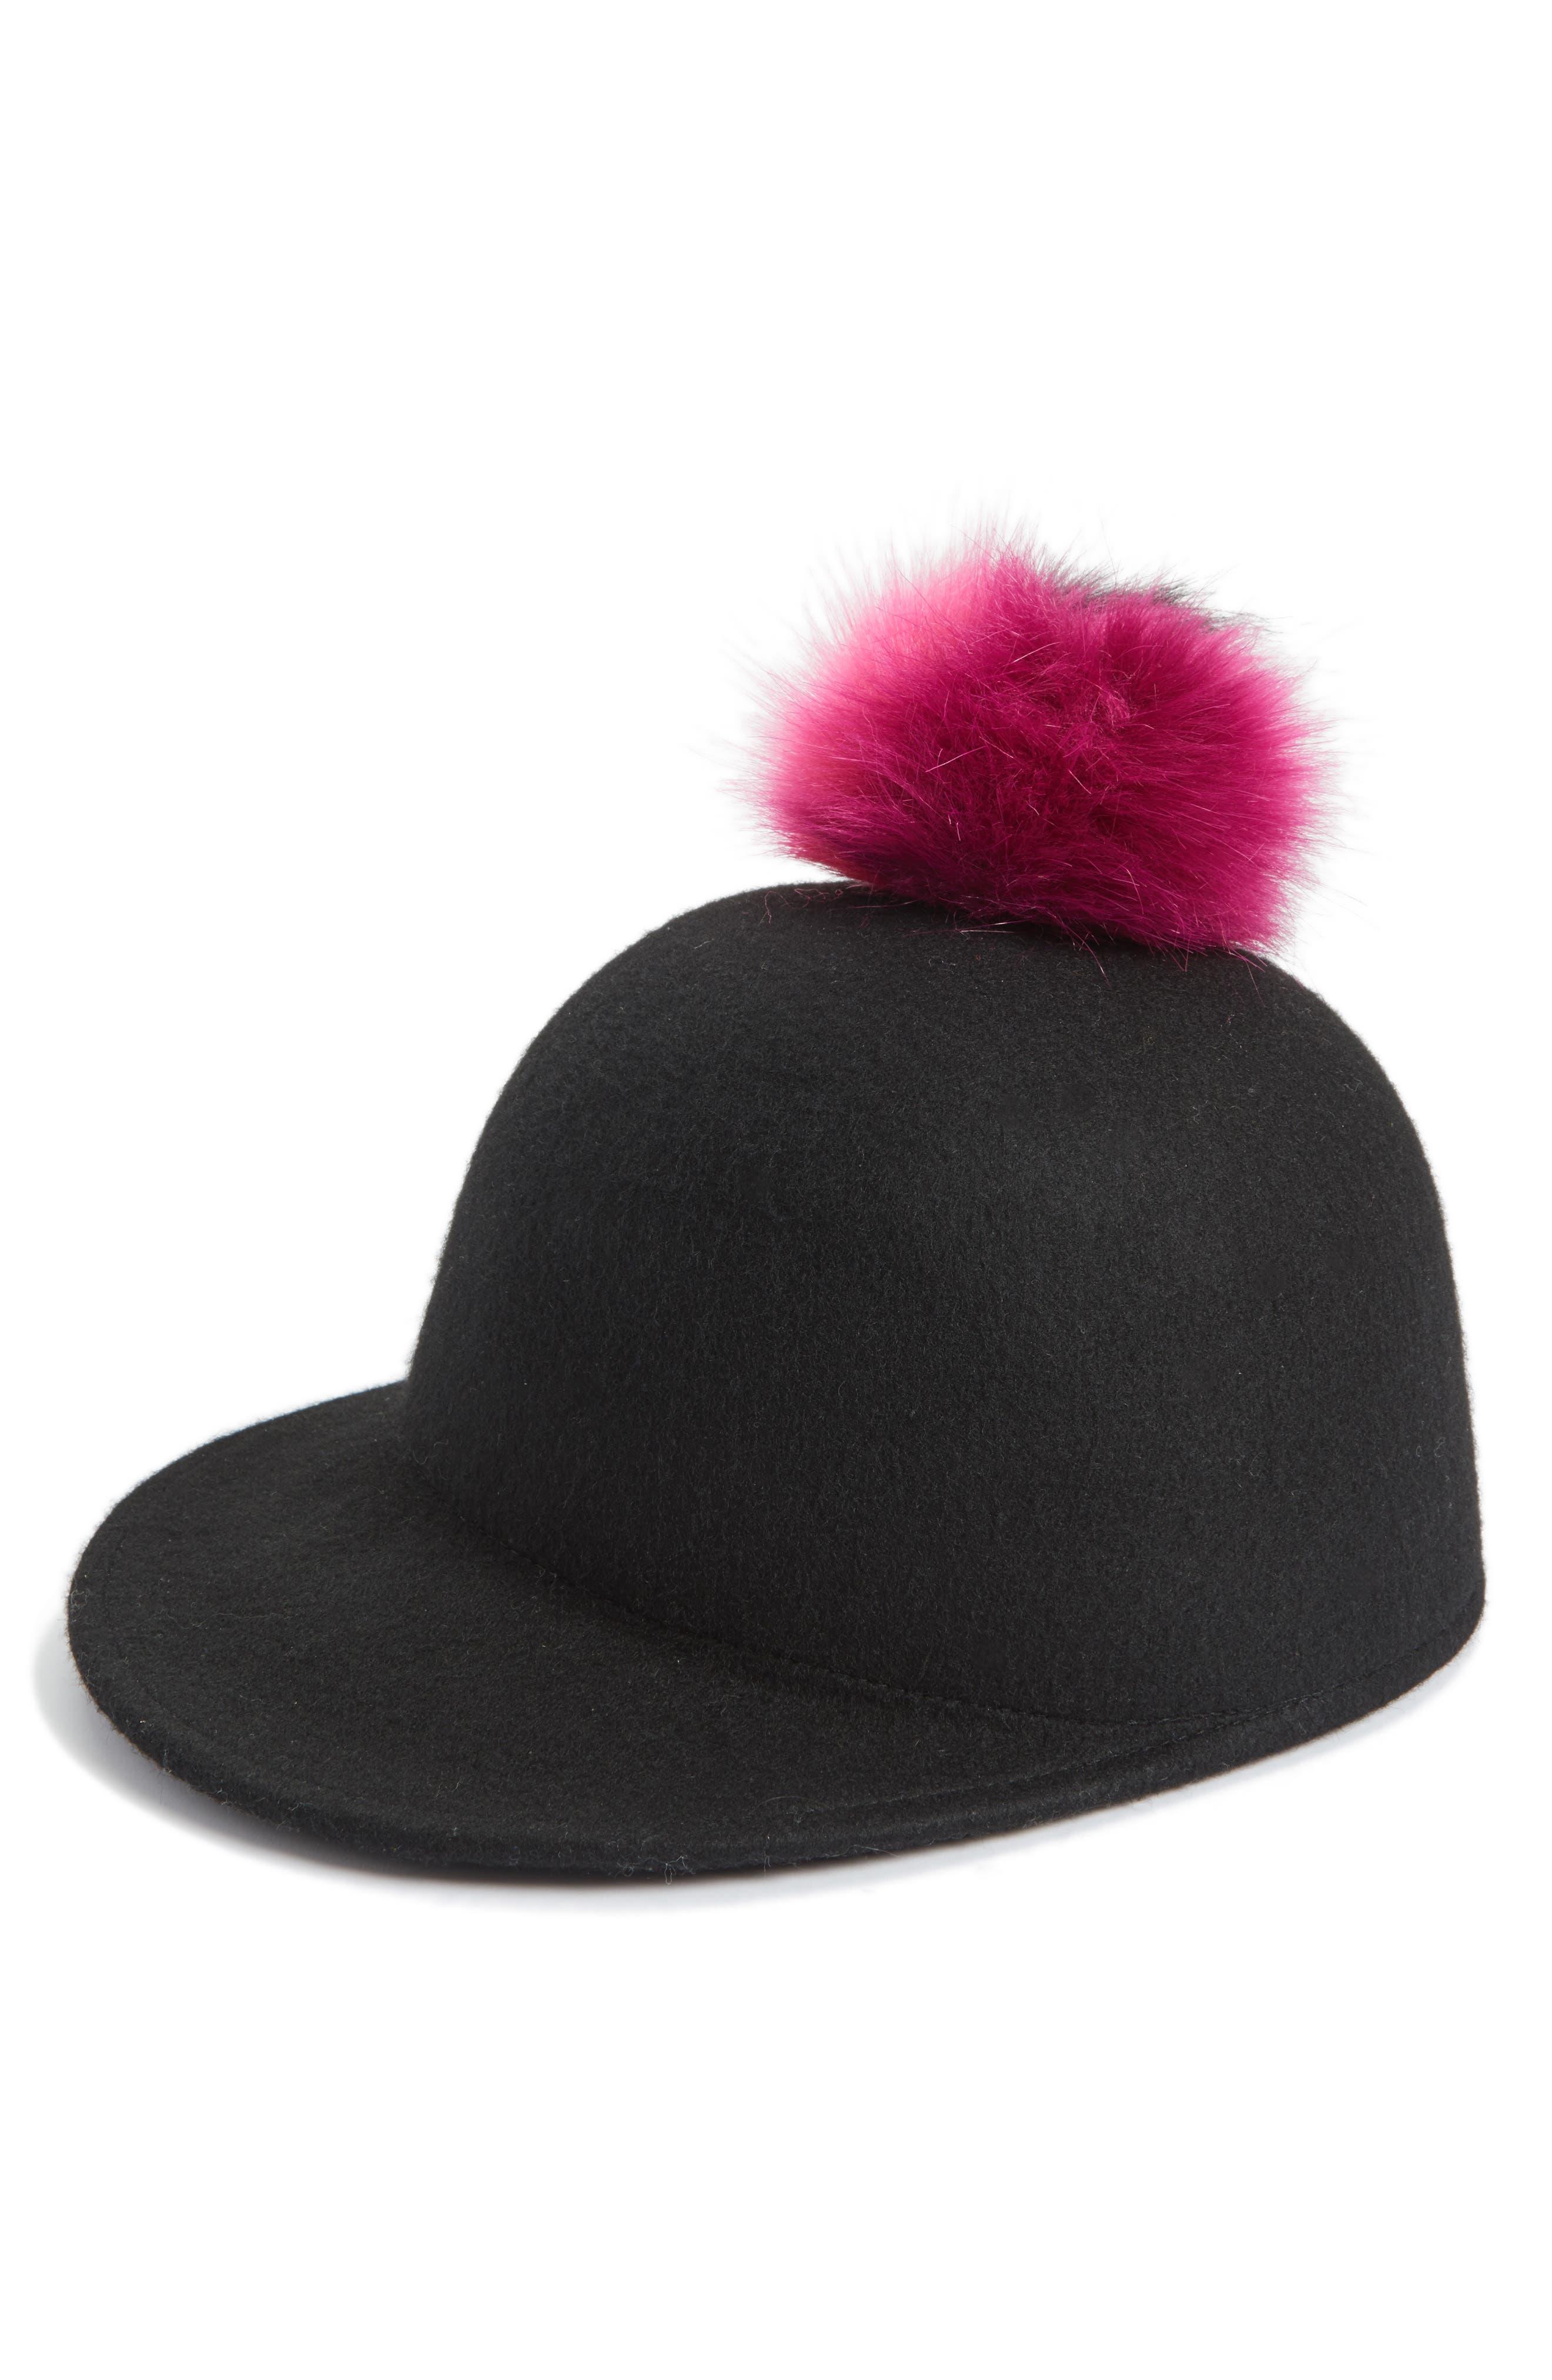 Alternate Image 1 Selected - Halogen® Faux Fur Pom Jockey Cap